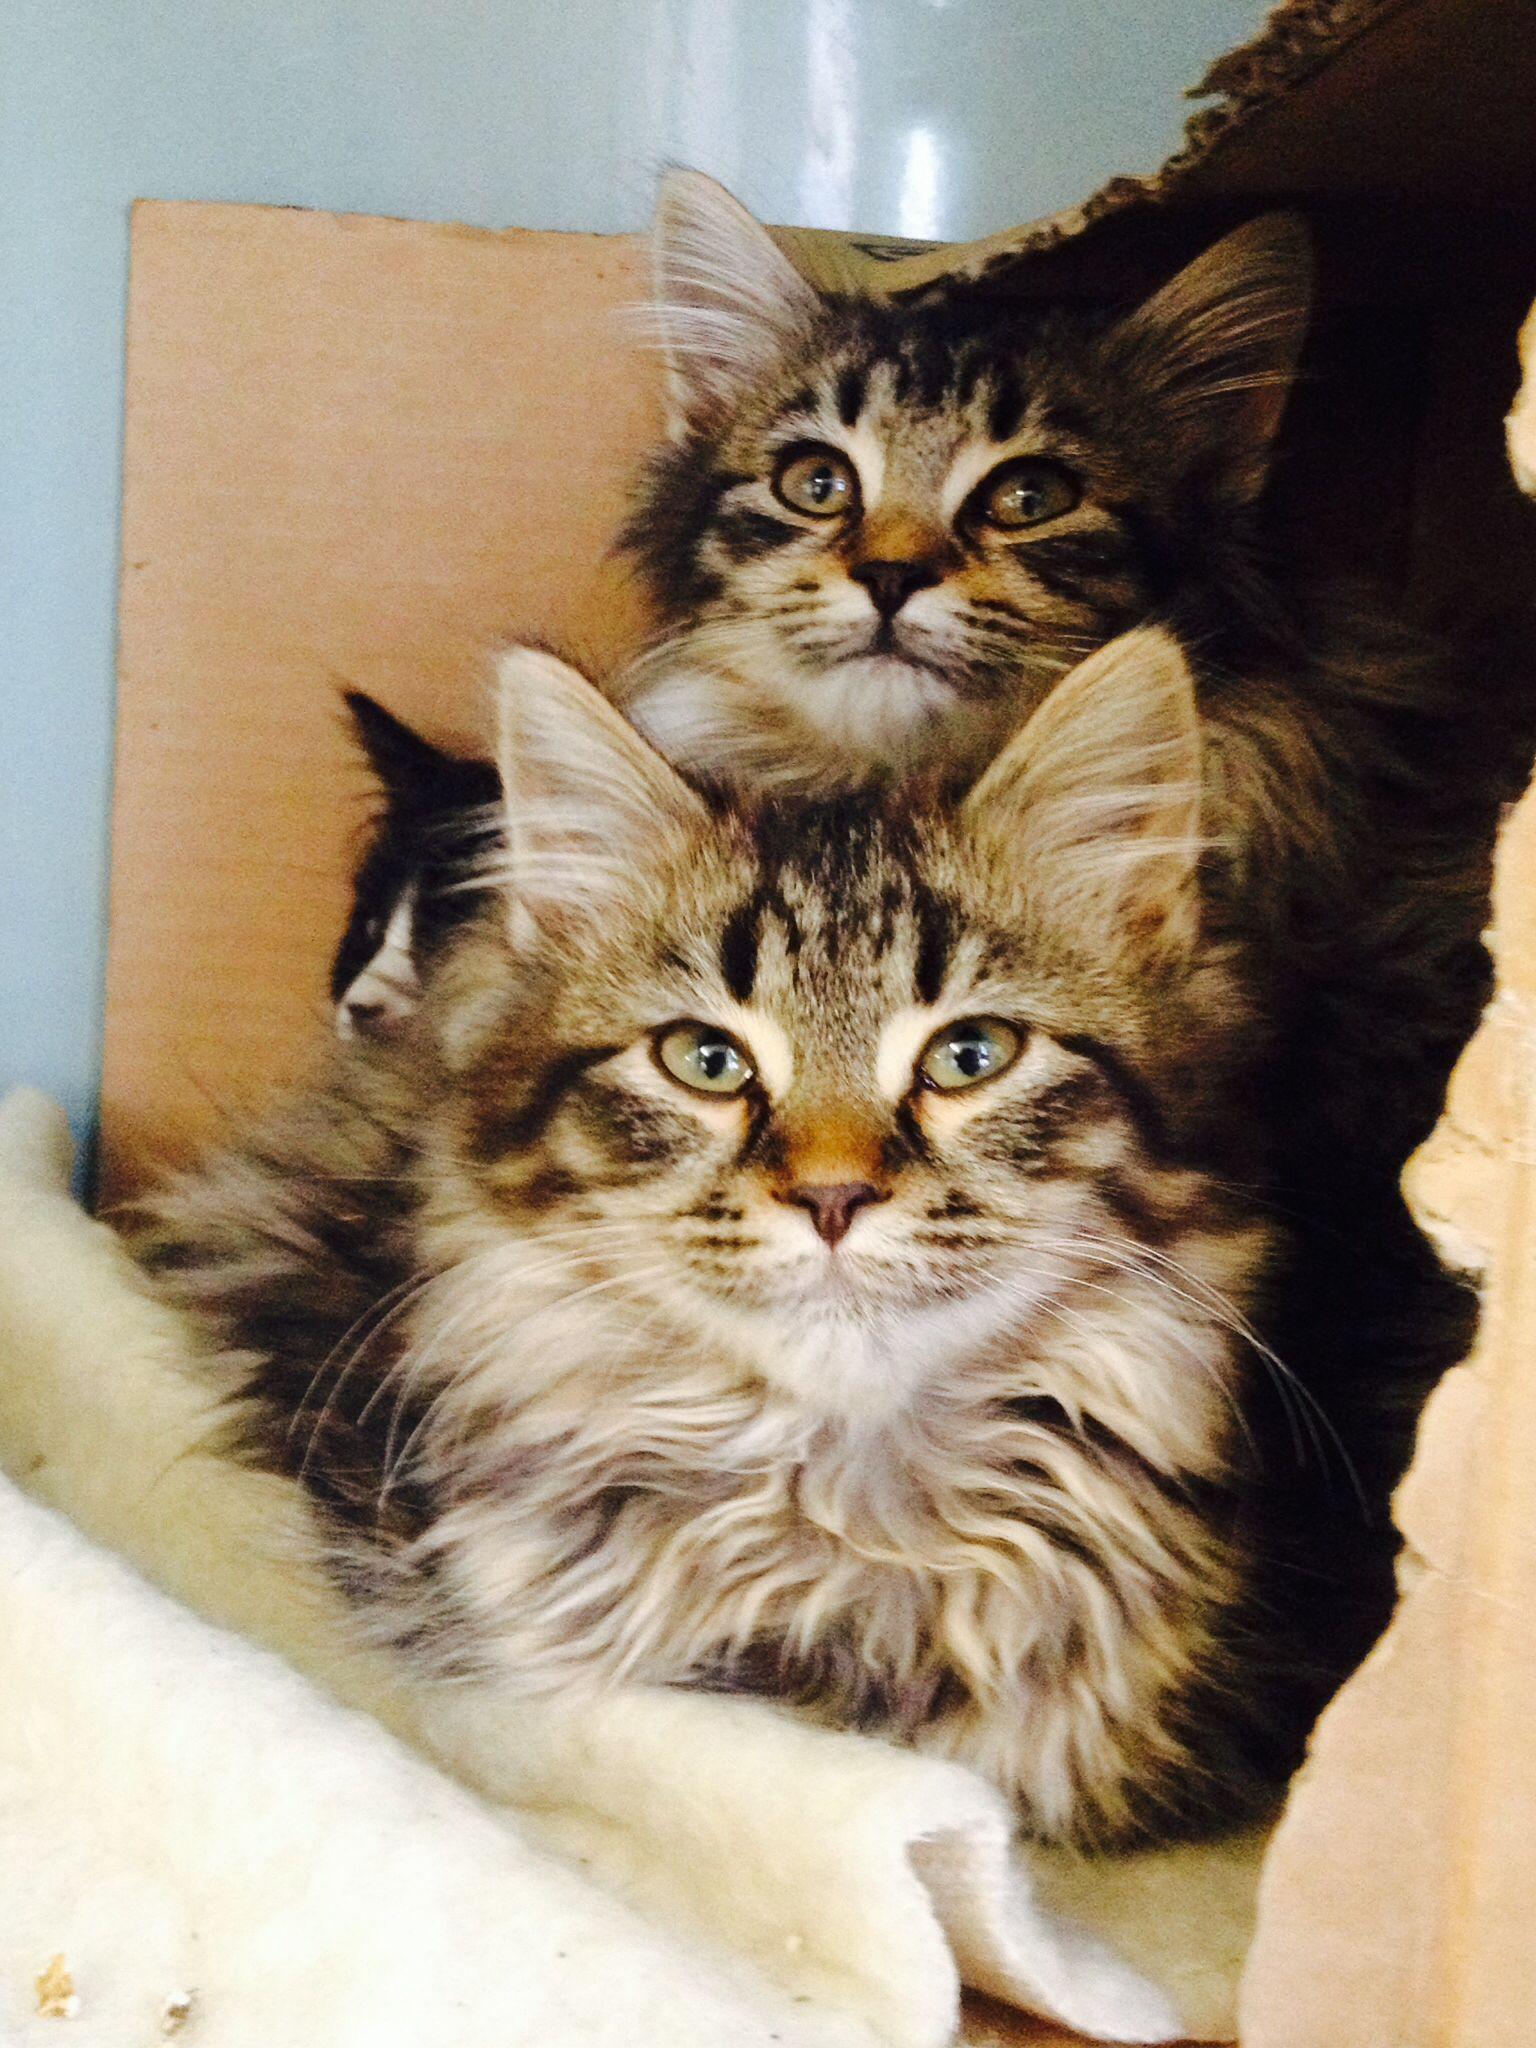 Kittens for adoption Kitten adoption, Cute animals, Animals